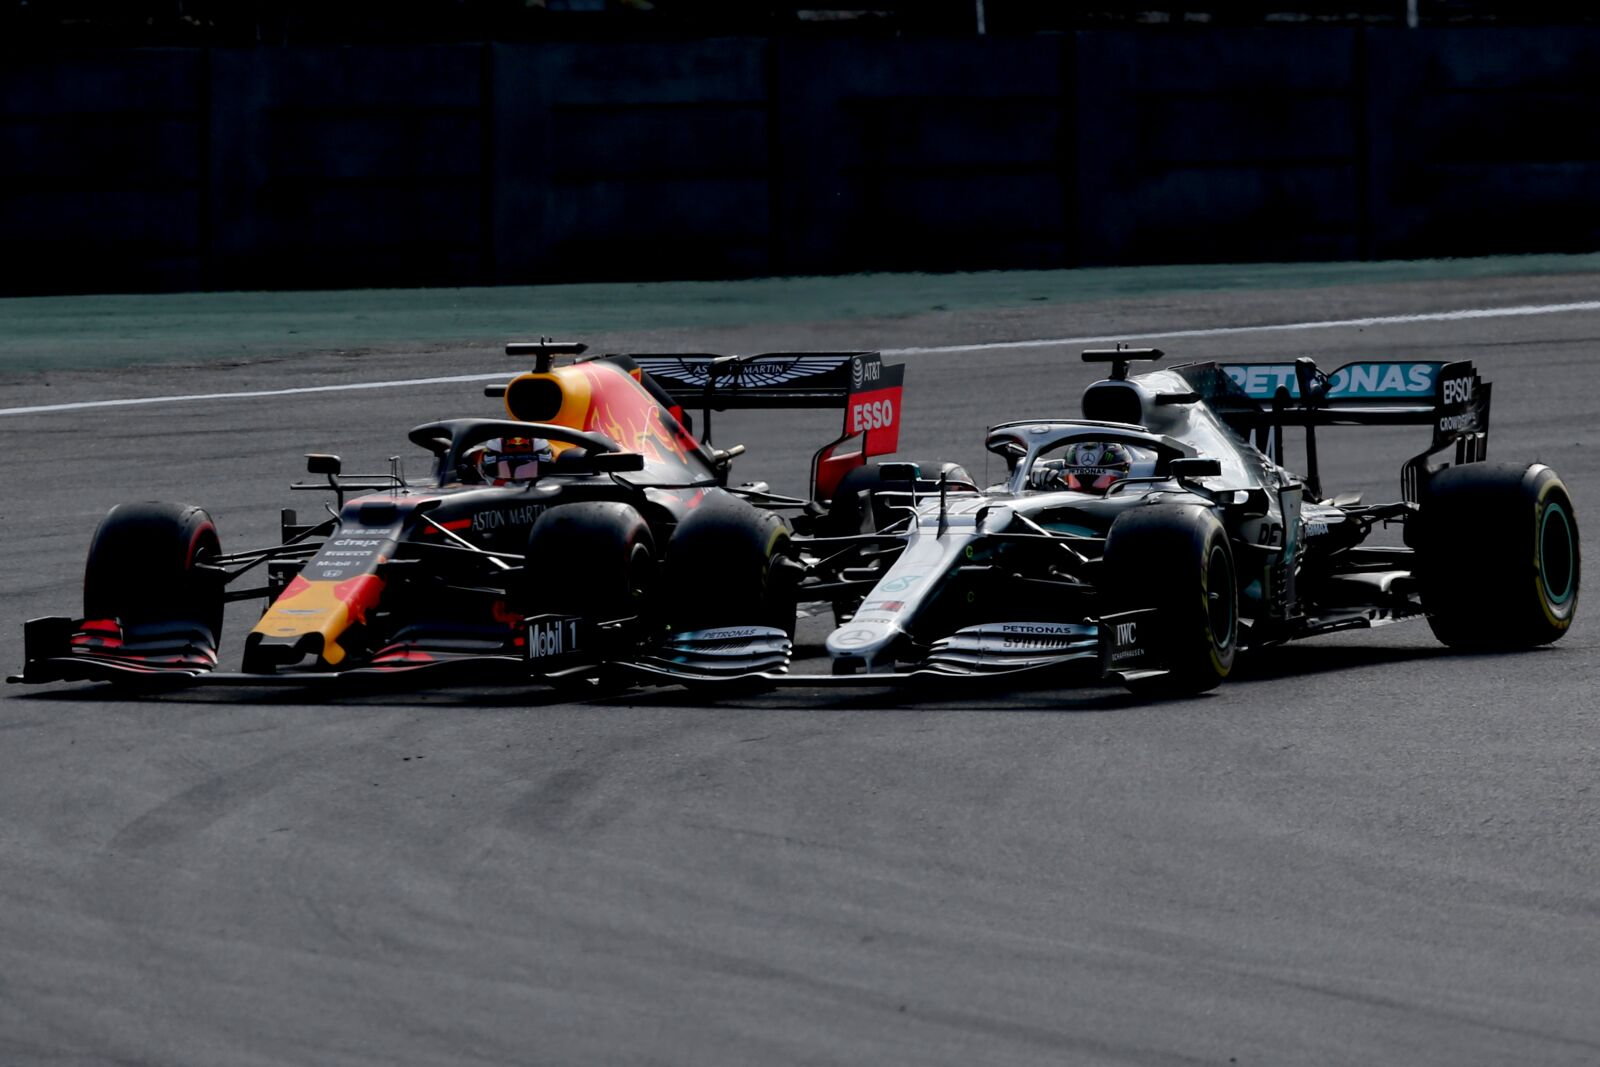 Formula 1: Max Verstappen holds the key to dethroning Lewis Hamilton